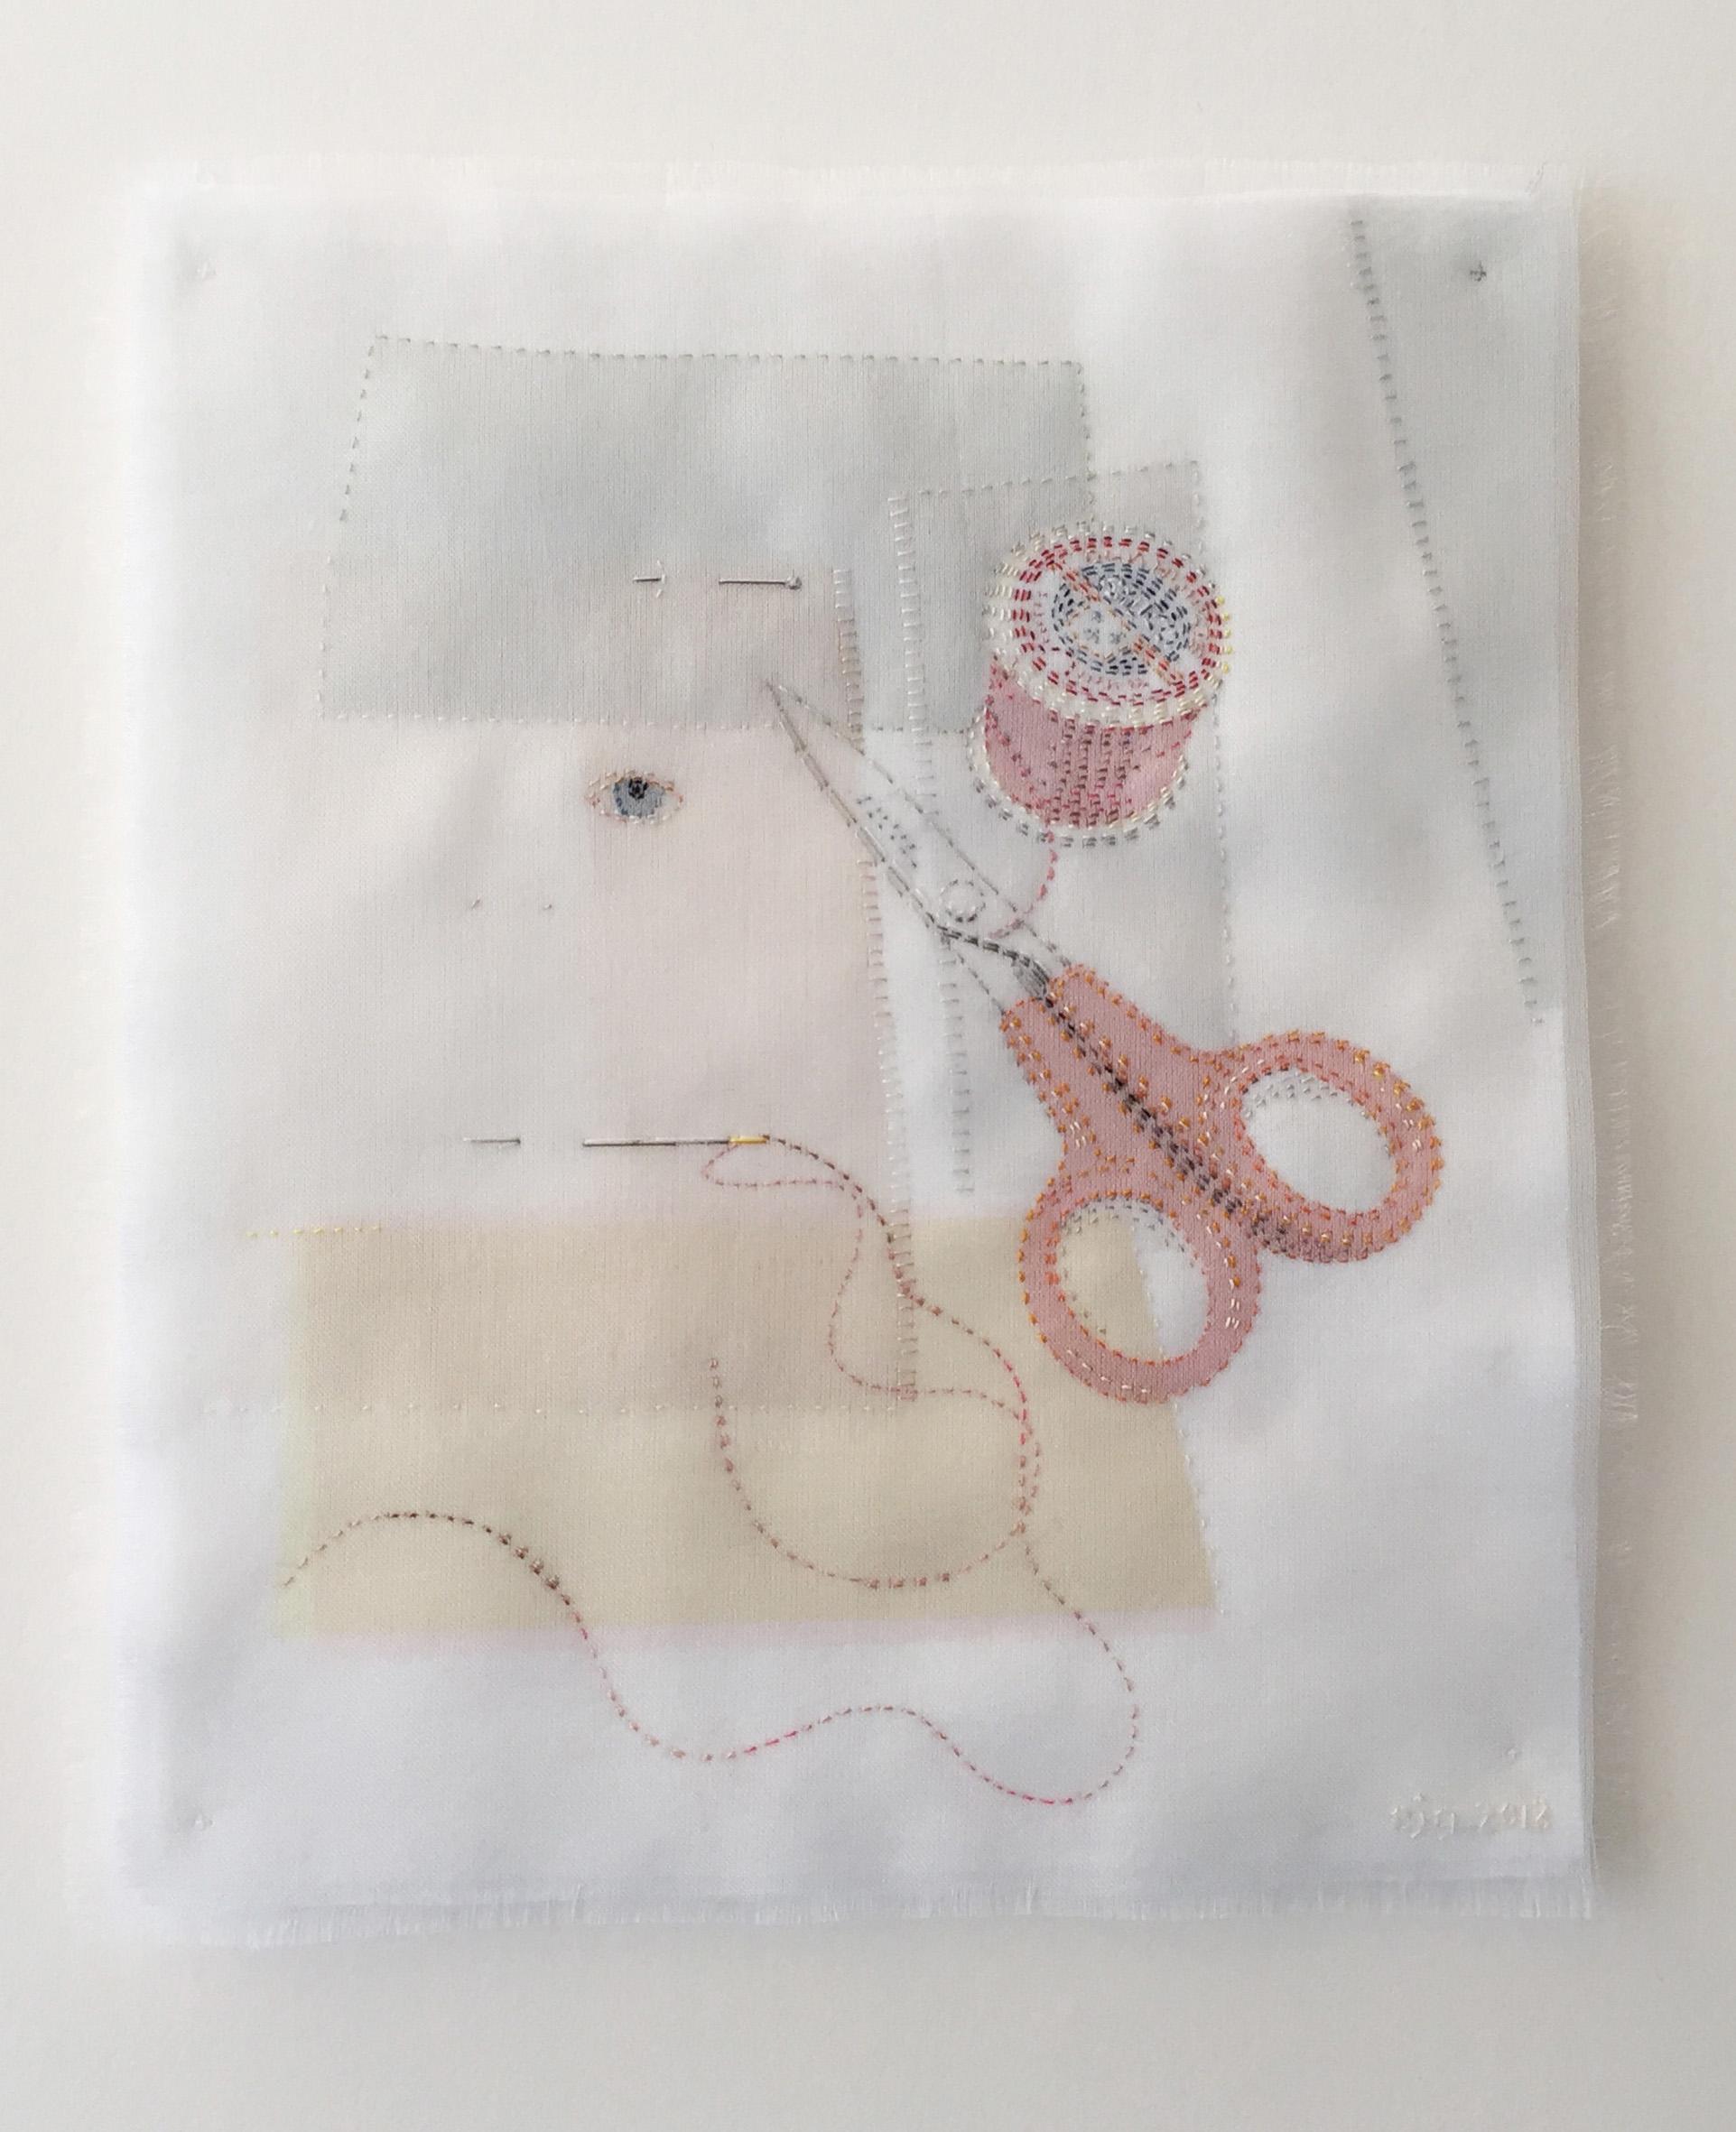 Portrait of a Textile Artist - Silk organza appliqué, hand stitched - £1300